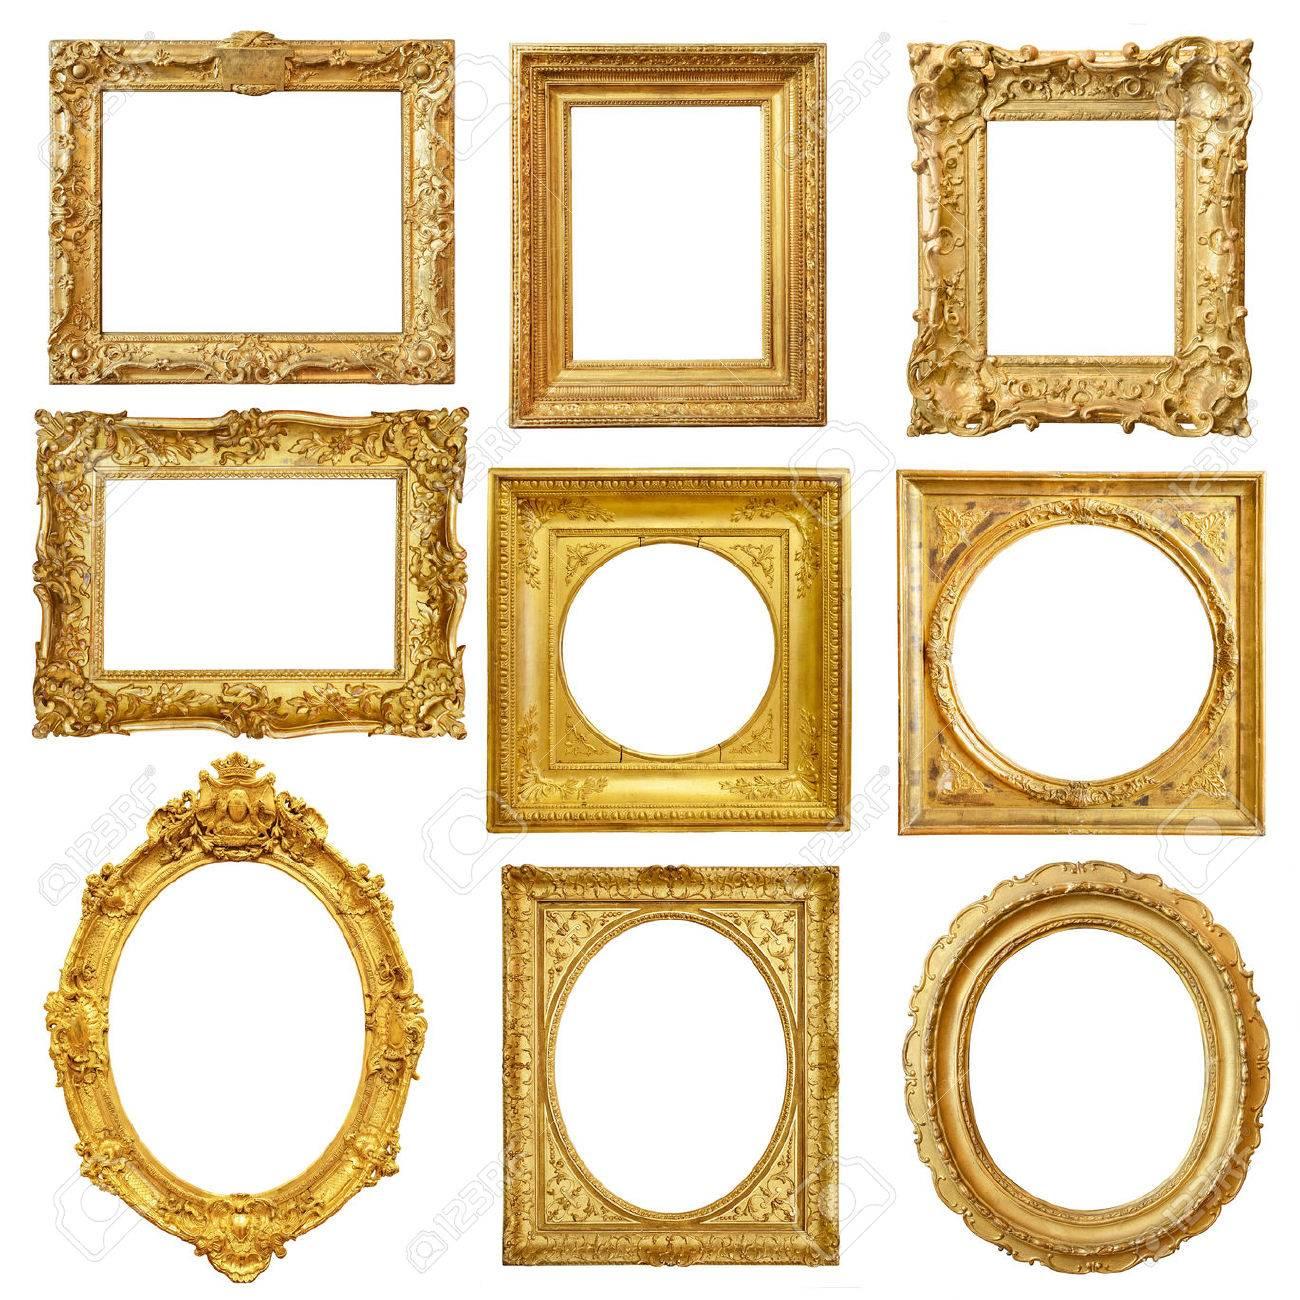 Set of golden vintage frame isolated on white background Stock Photo - 48930219